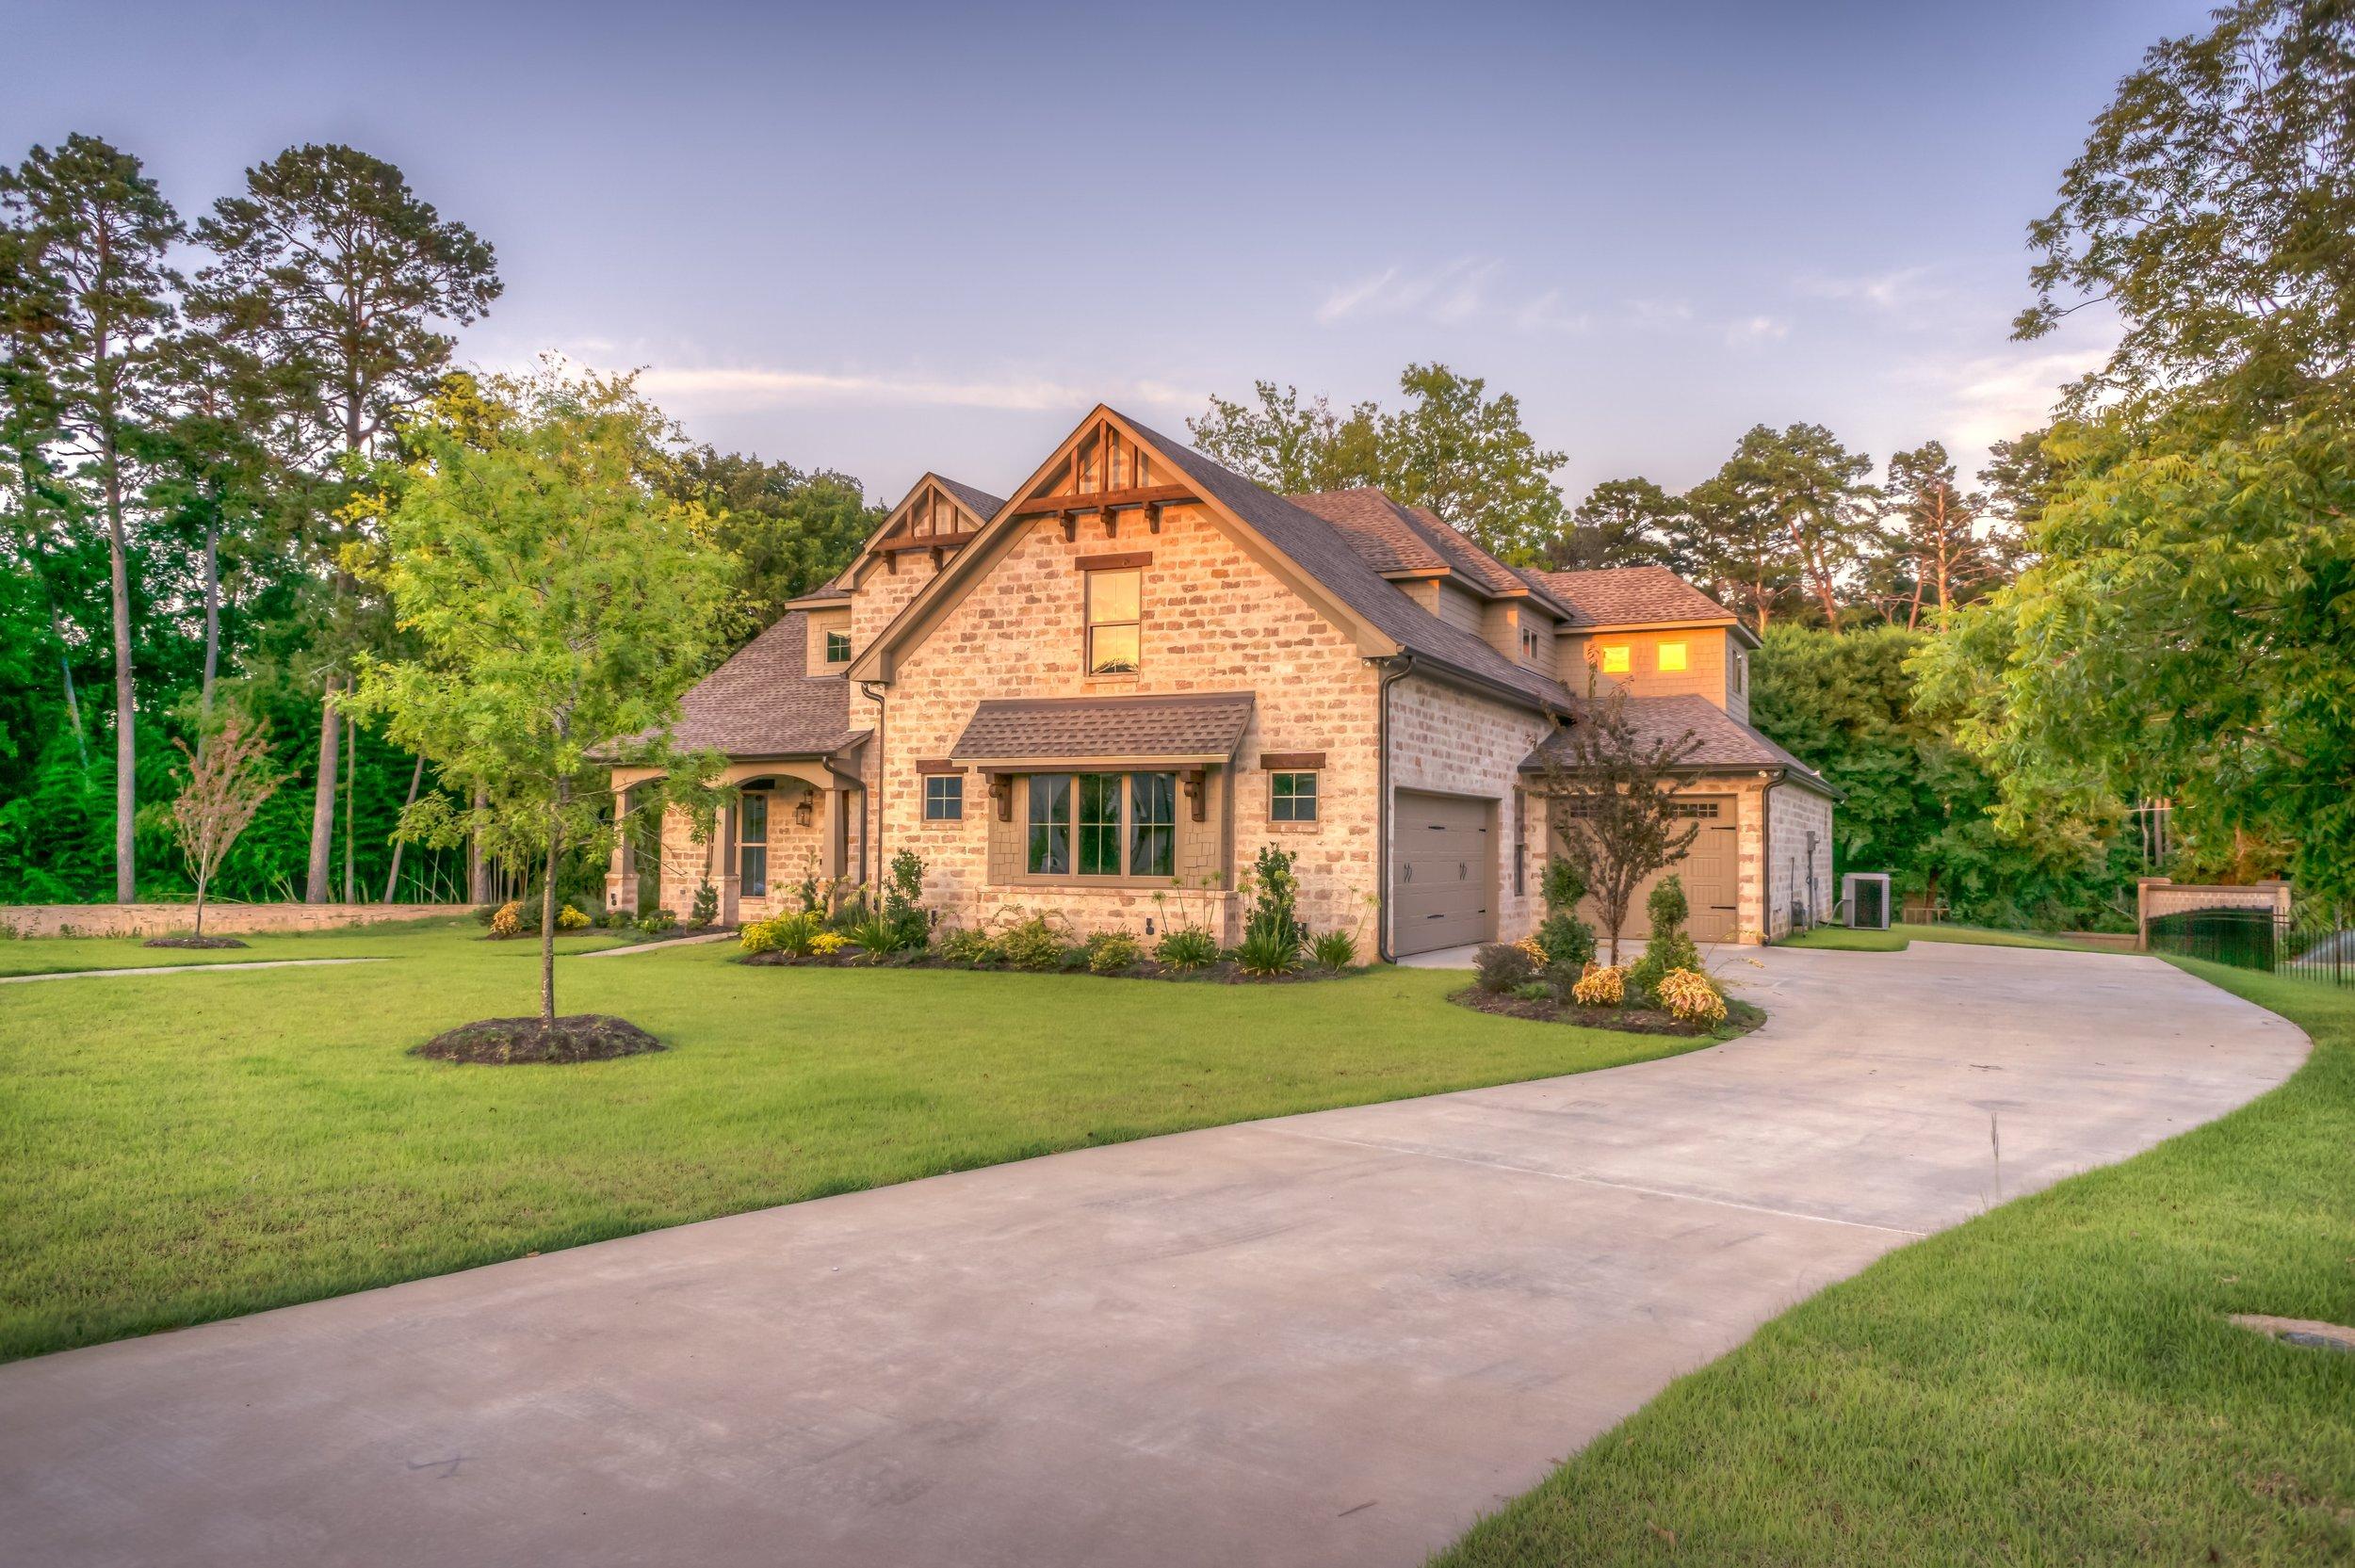 architecture-exterior-renovation-addition-259588.jpg